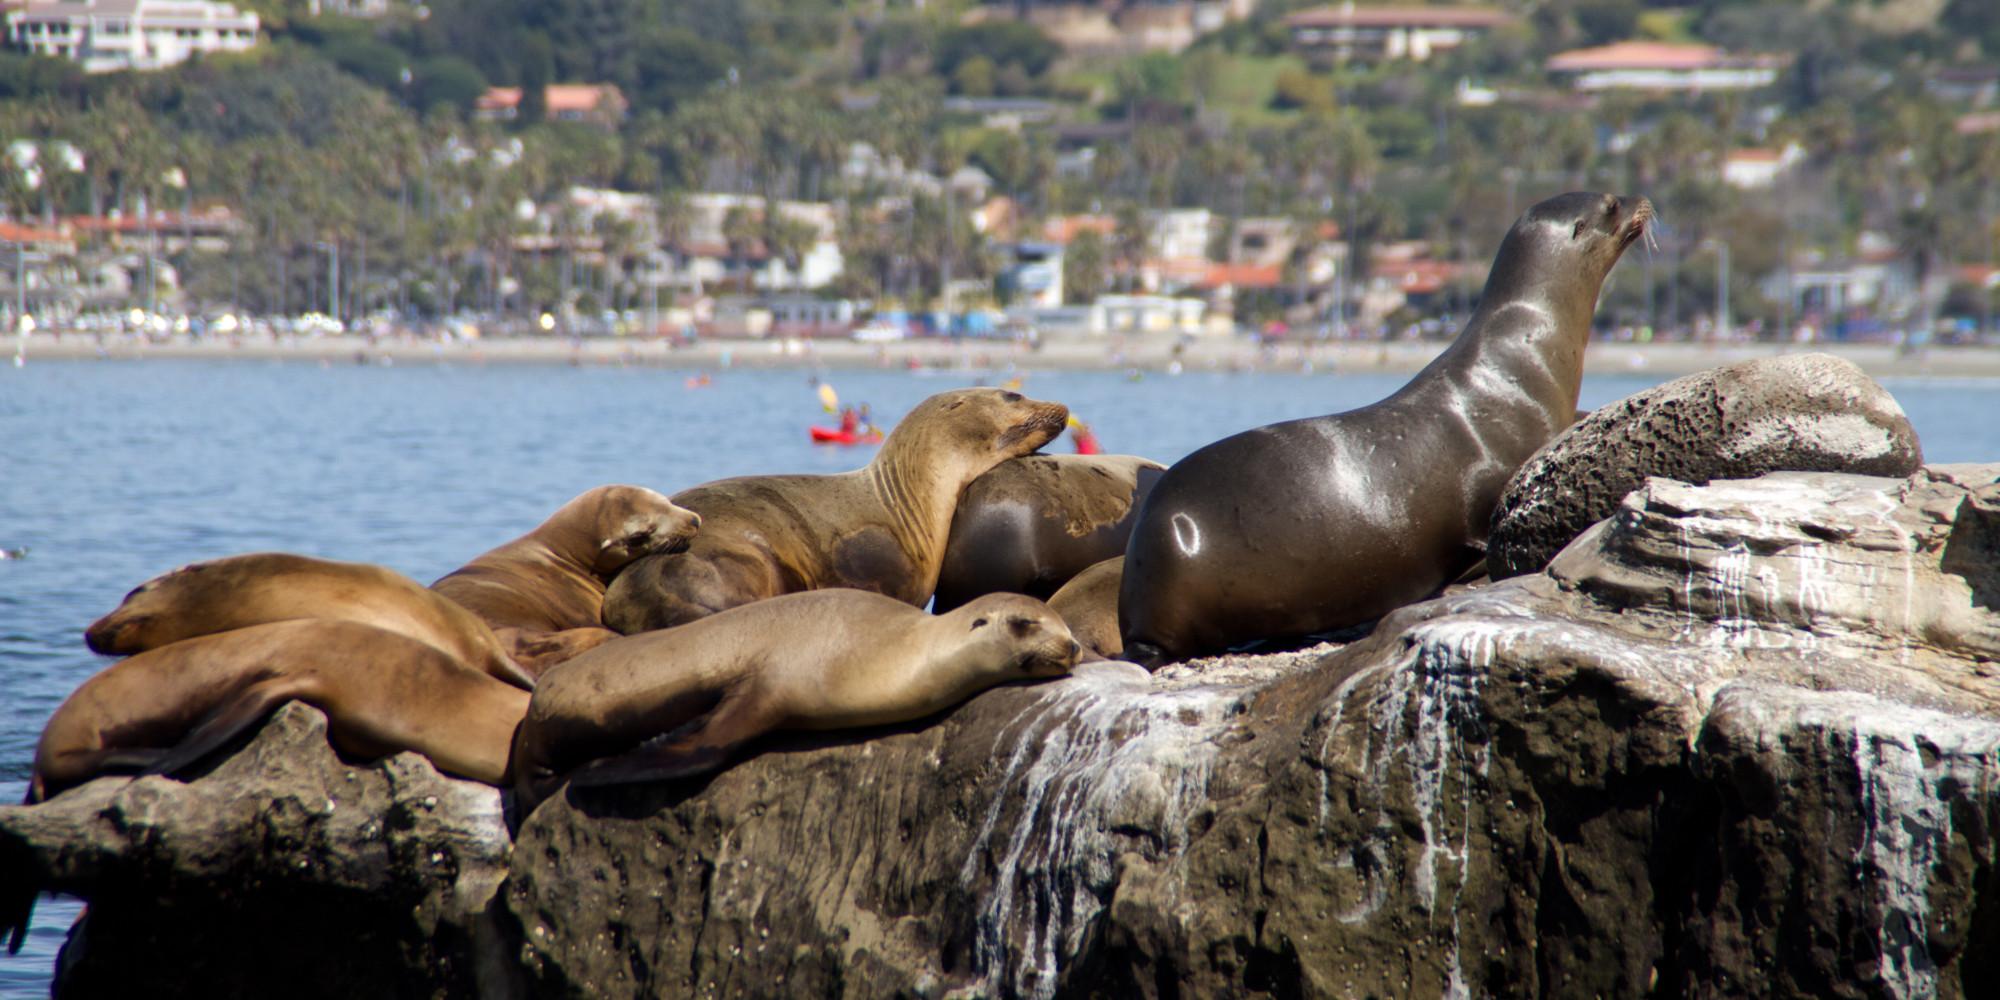 Sea Lion Poop In La Jolla Califorinia Irks Business